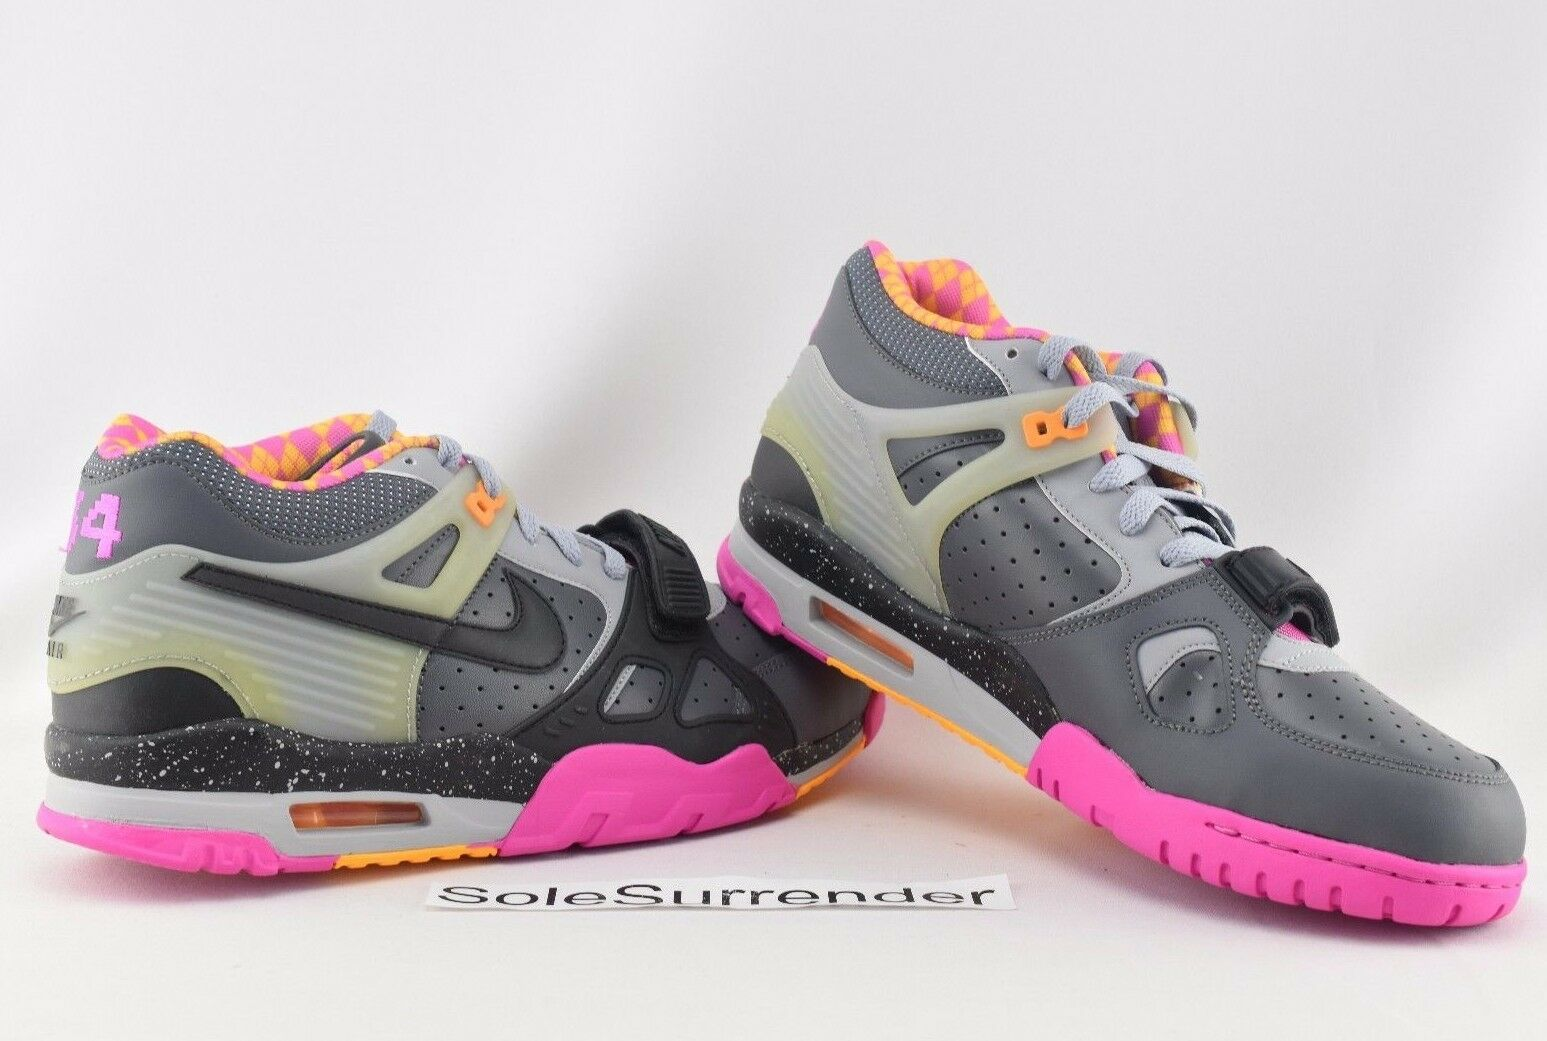 Nike Air Trainer III PMR QS - Elige tu talla carreras - Bo sabe de carreras talla de caballos b68be2